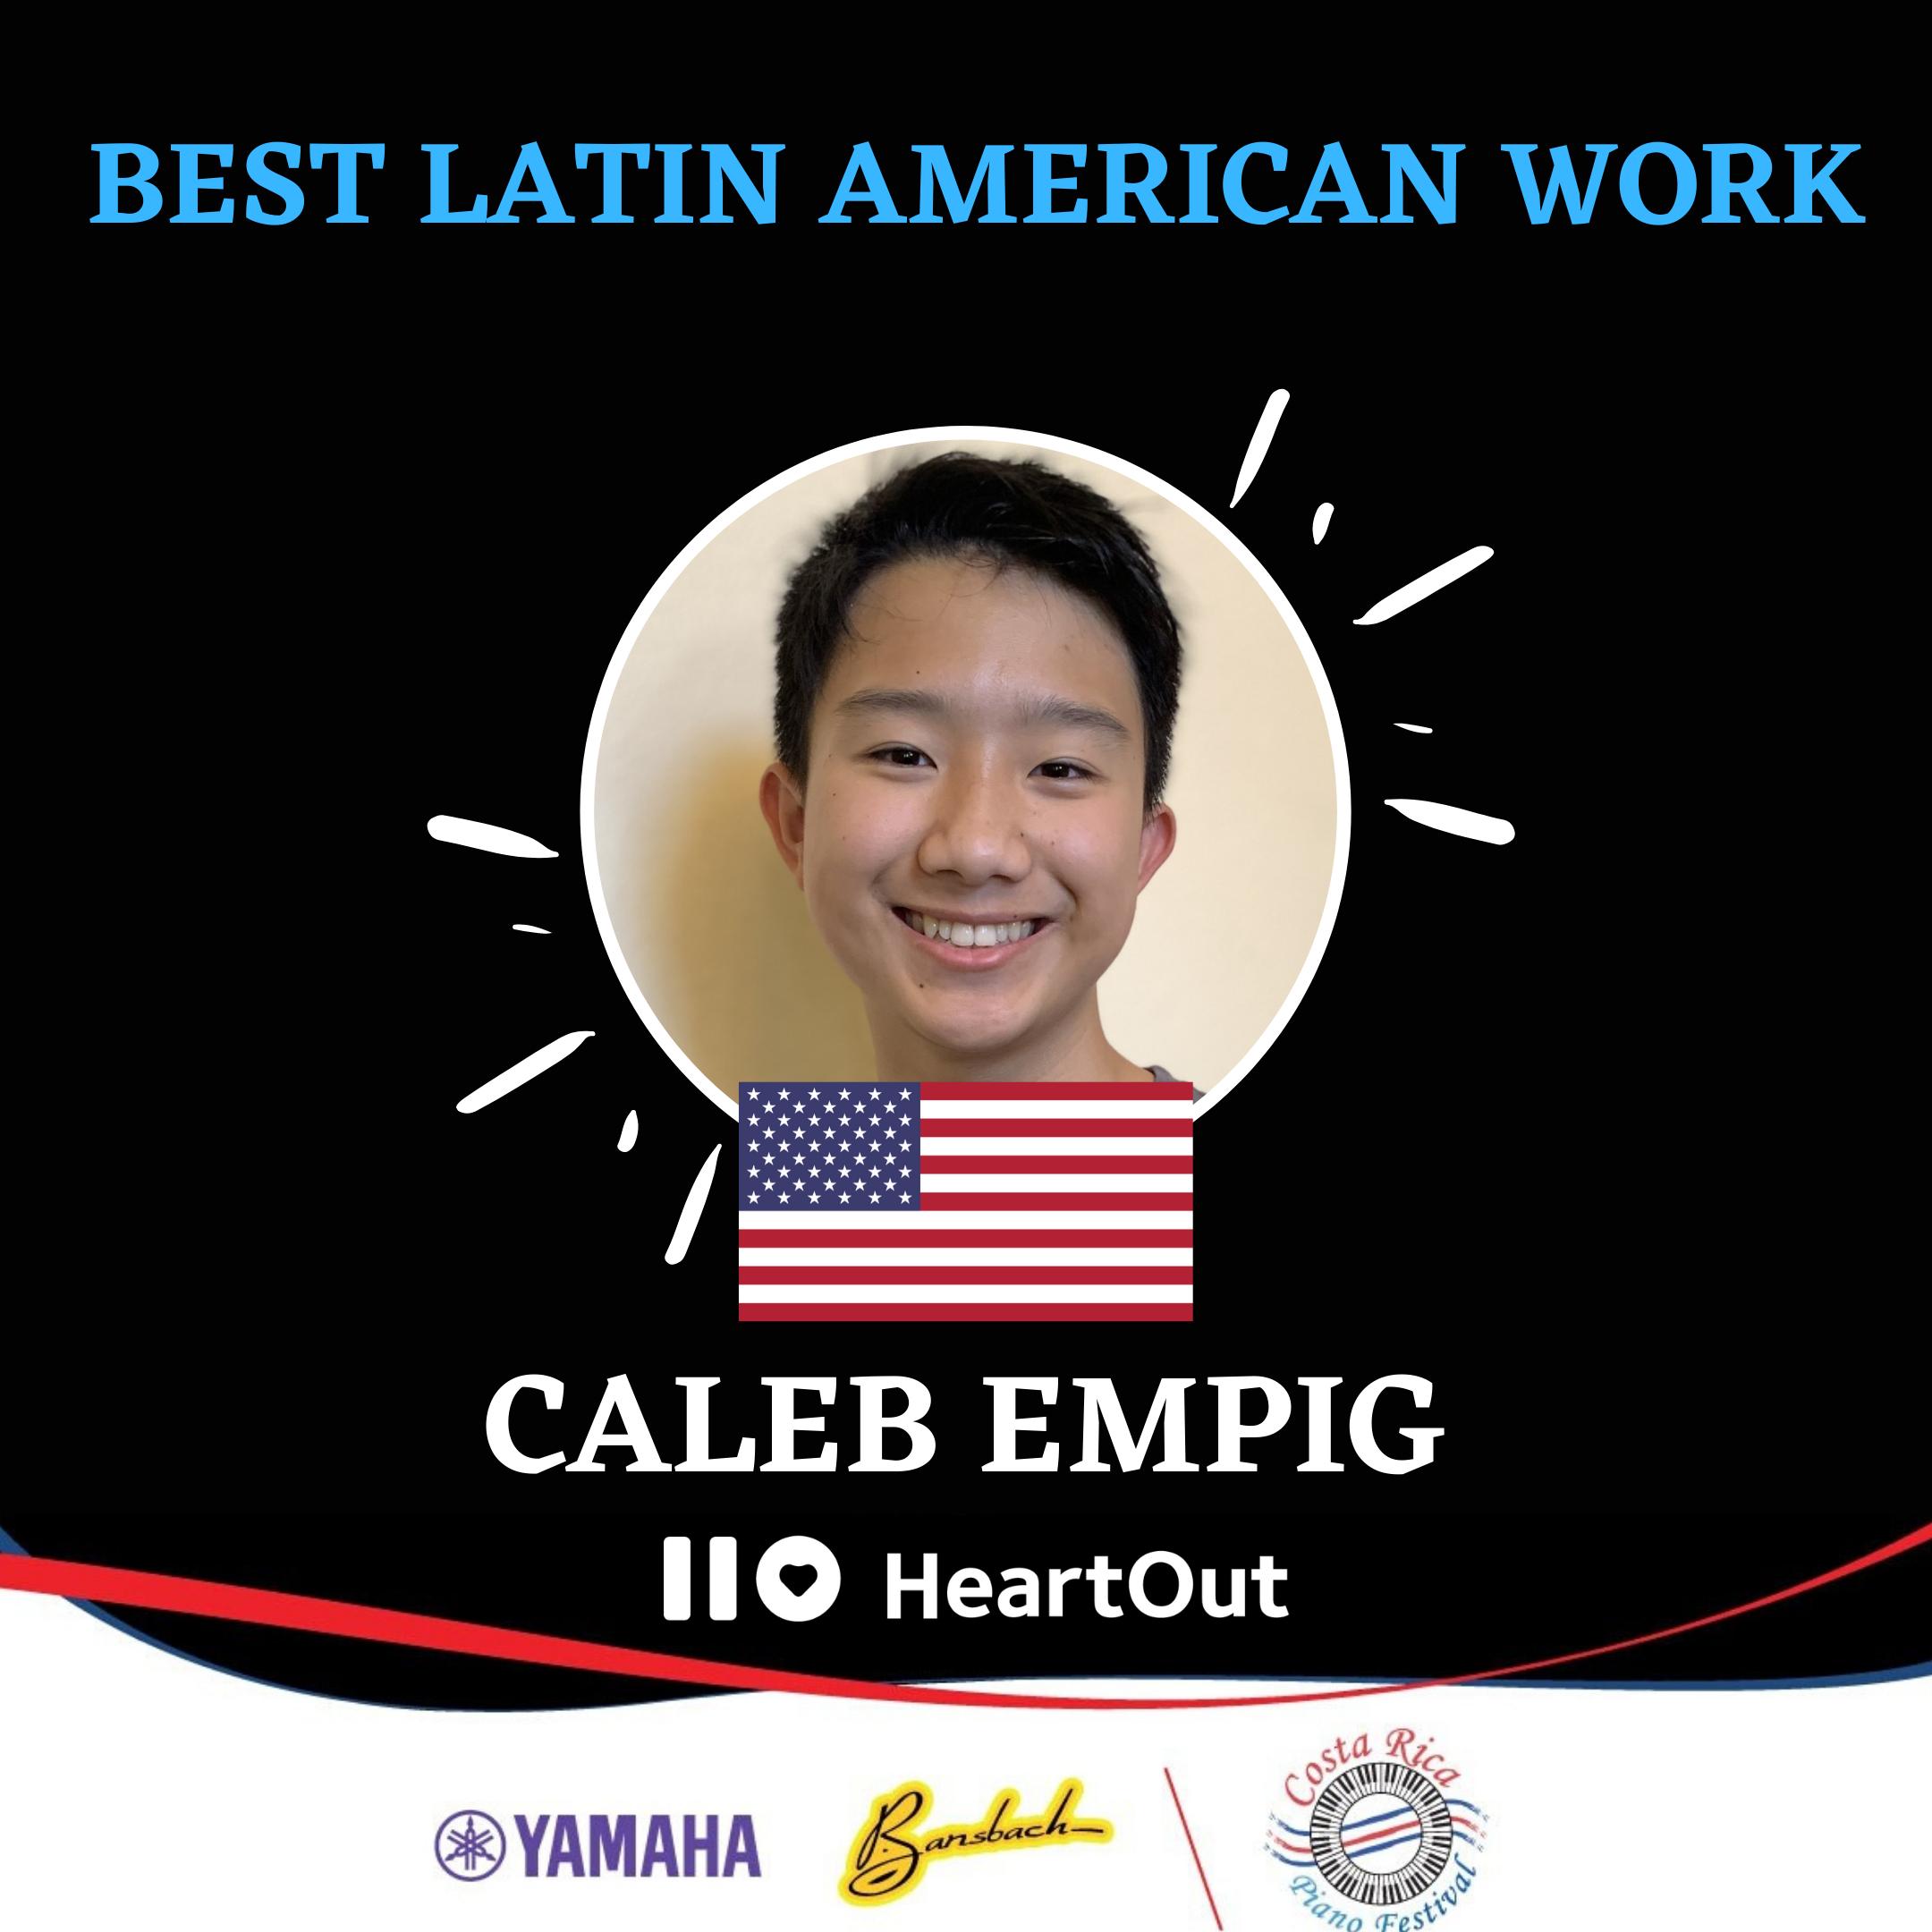 CRPF Caleb Empig